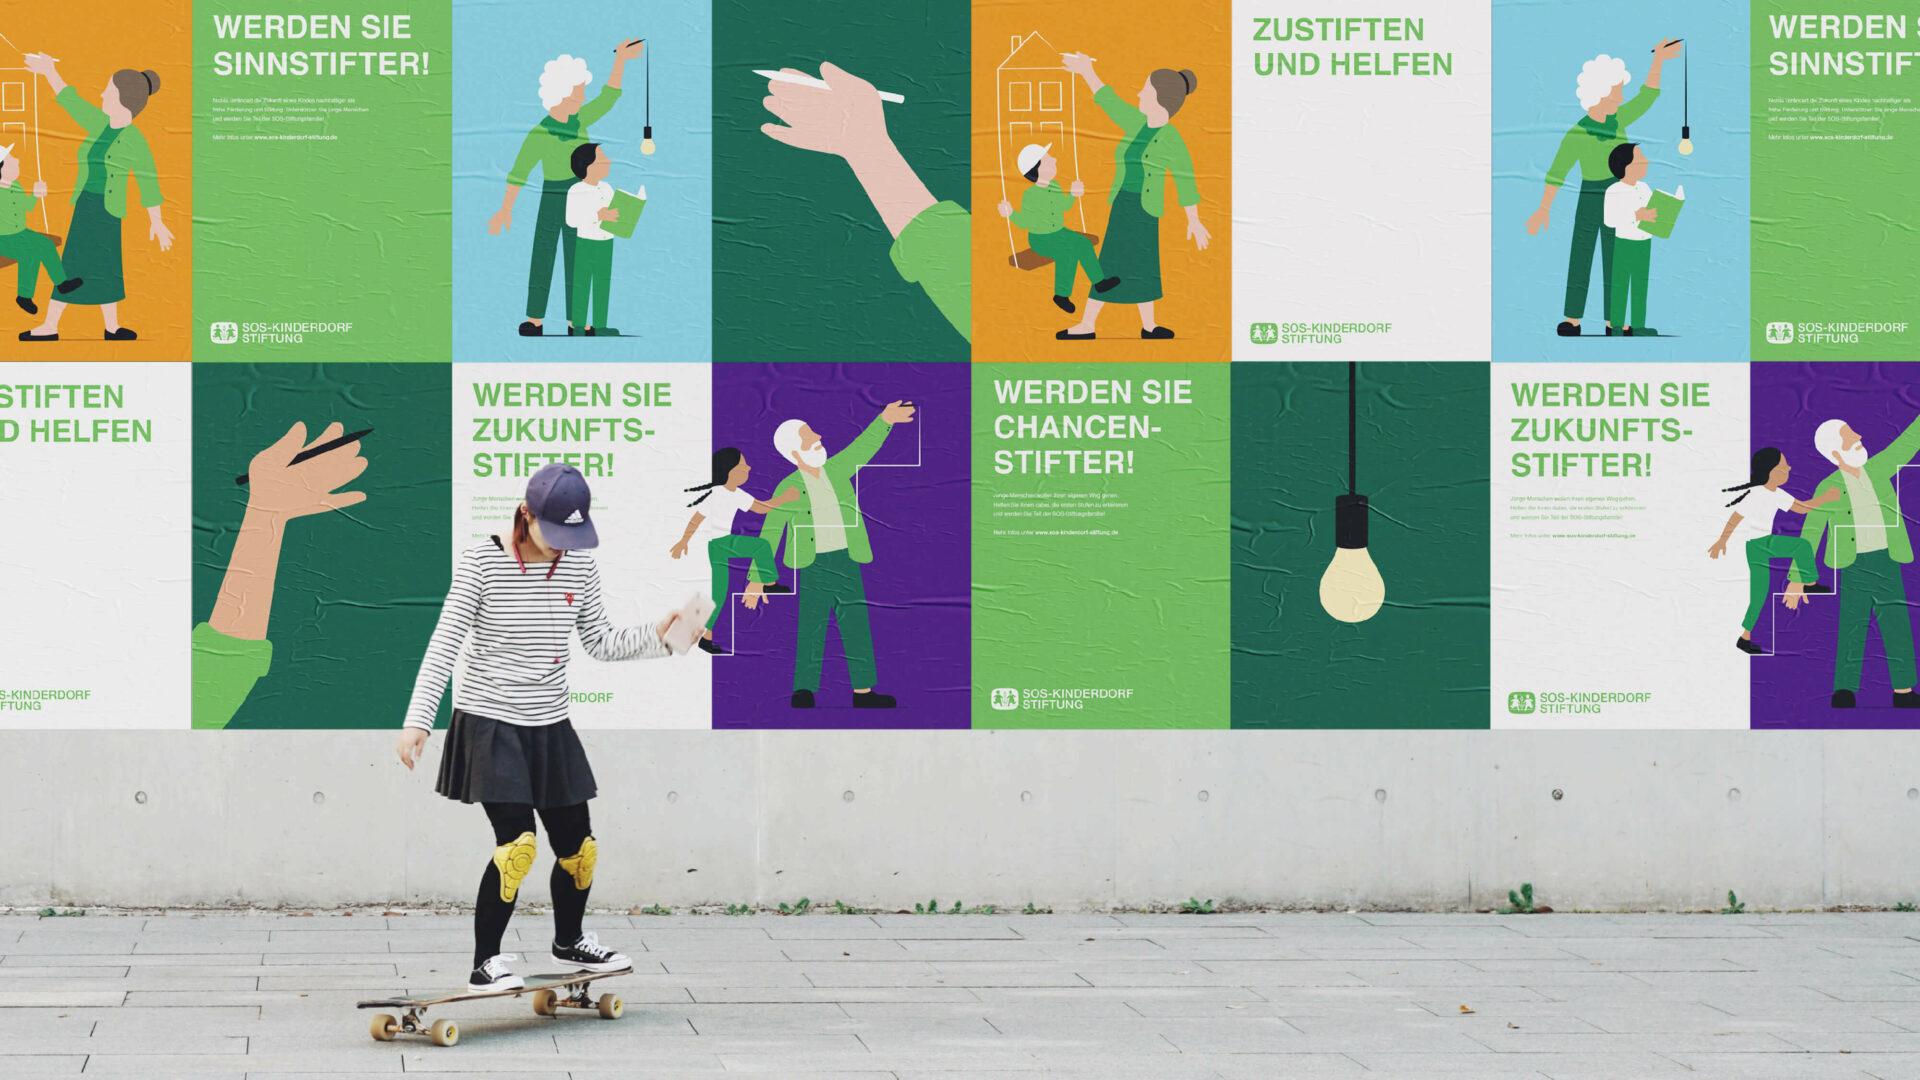 SOS-Kinderdorf Stiftung Posterwall